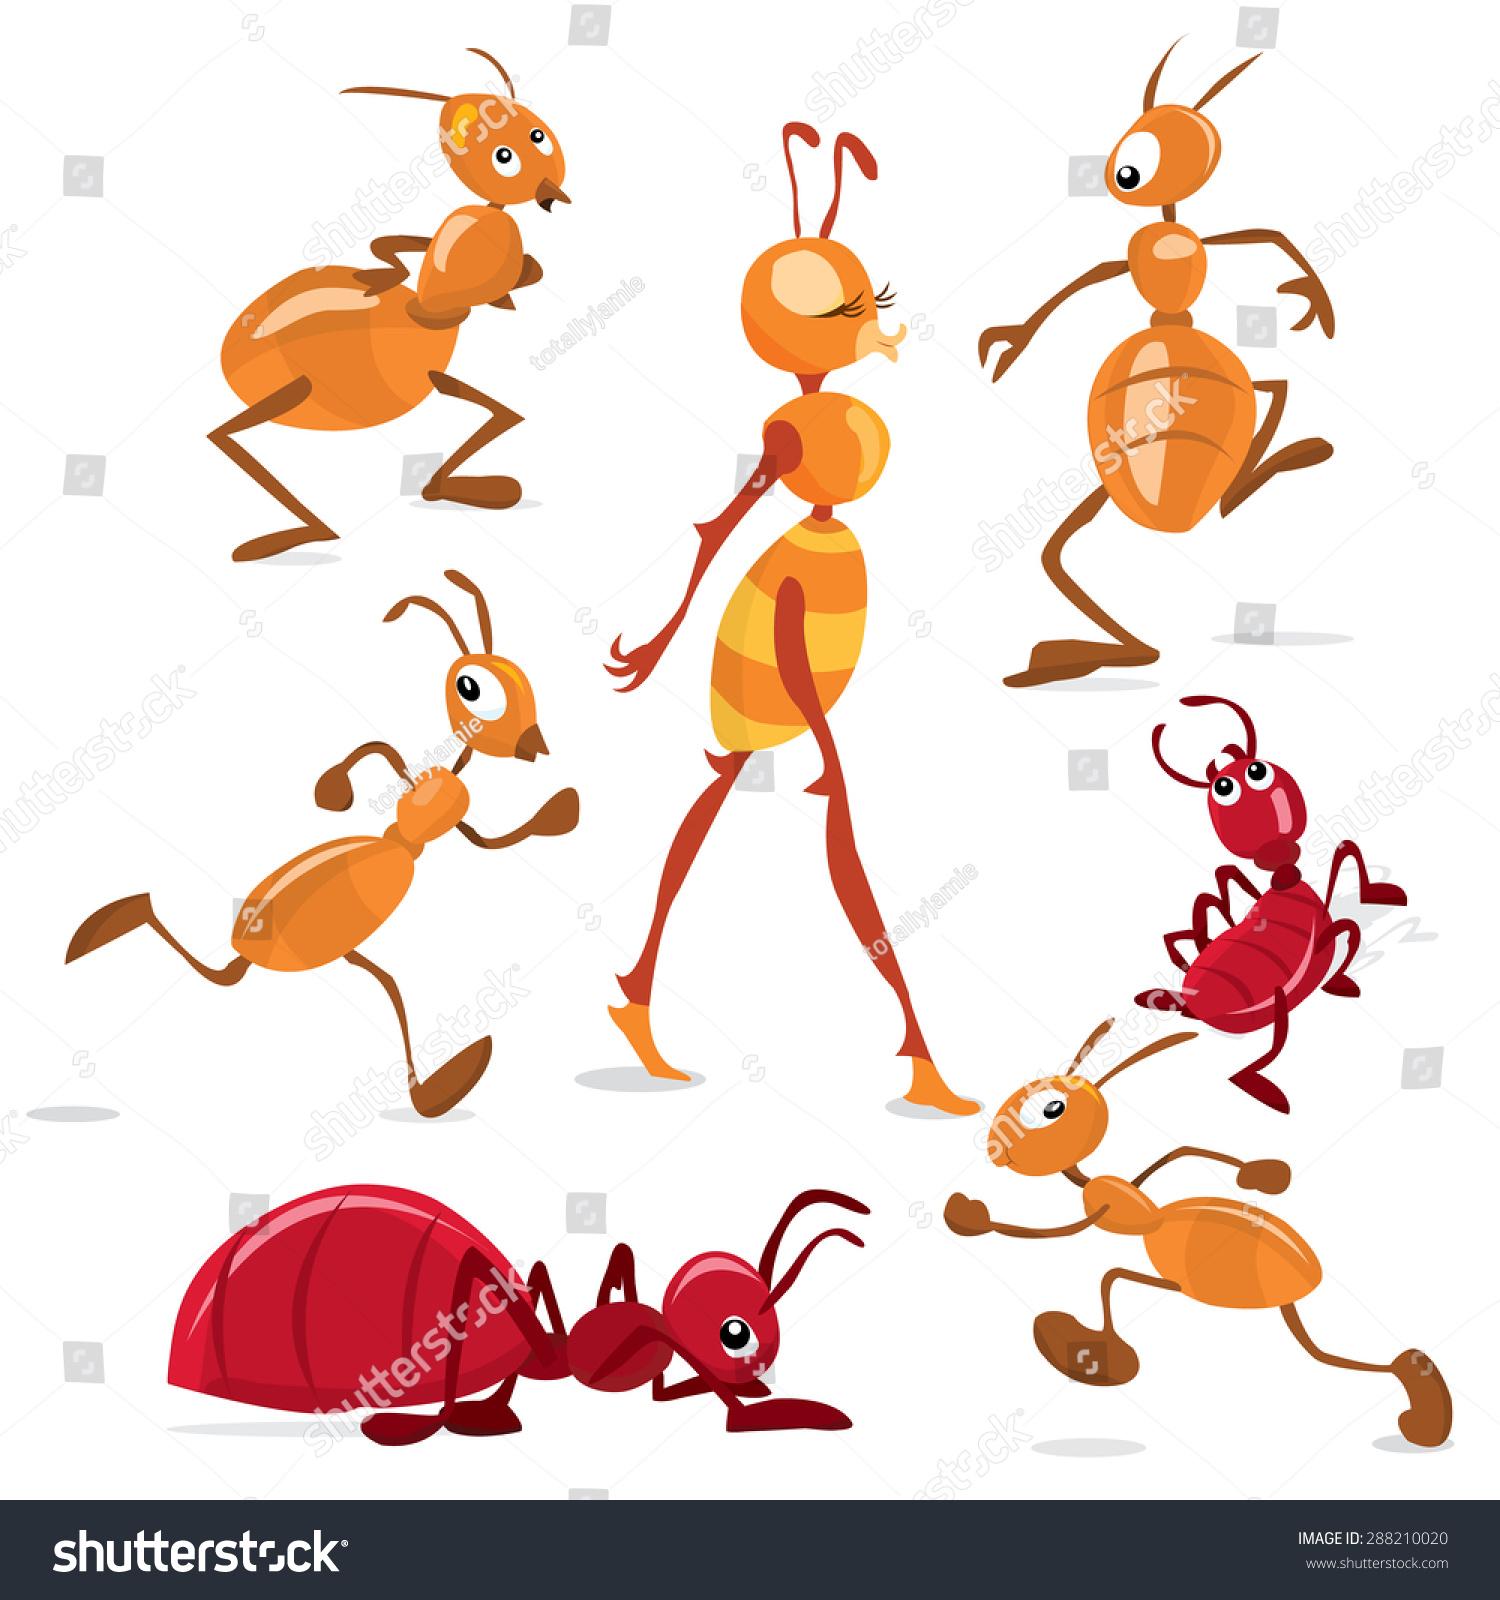 Queen ant cartoon images - photo#25